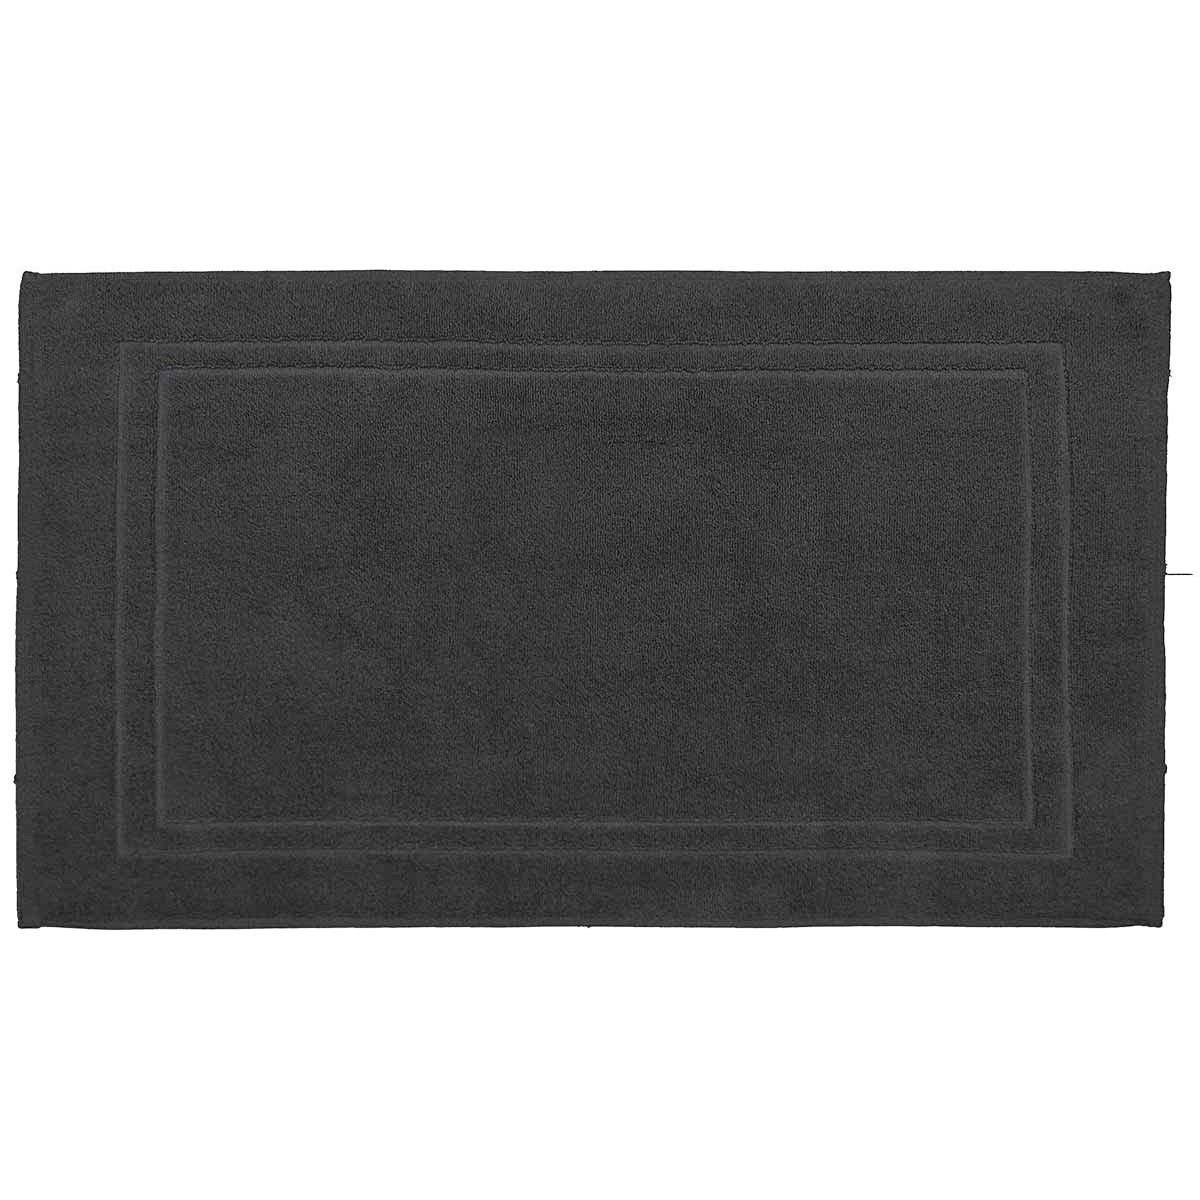 Tapis de bain 900gr/m² Anthracite 50x80 cm